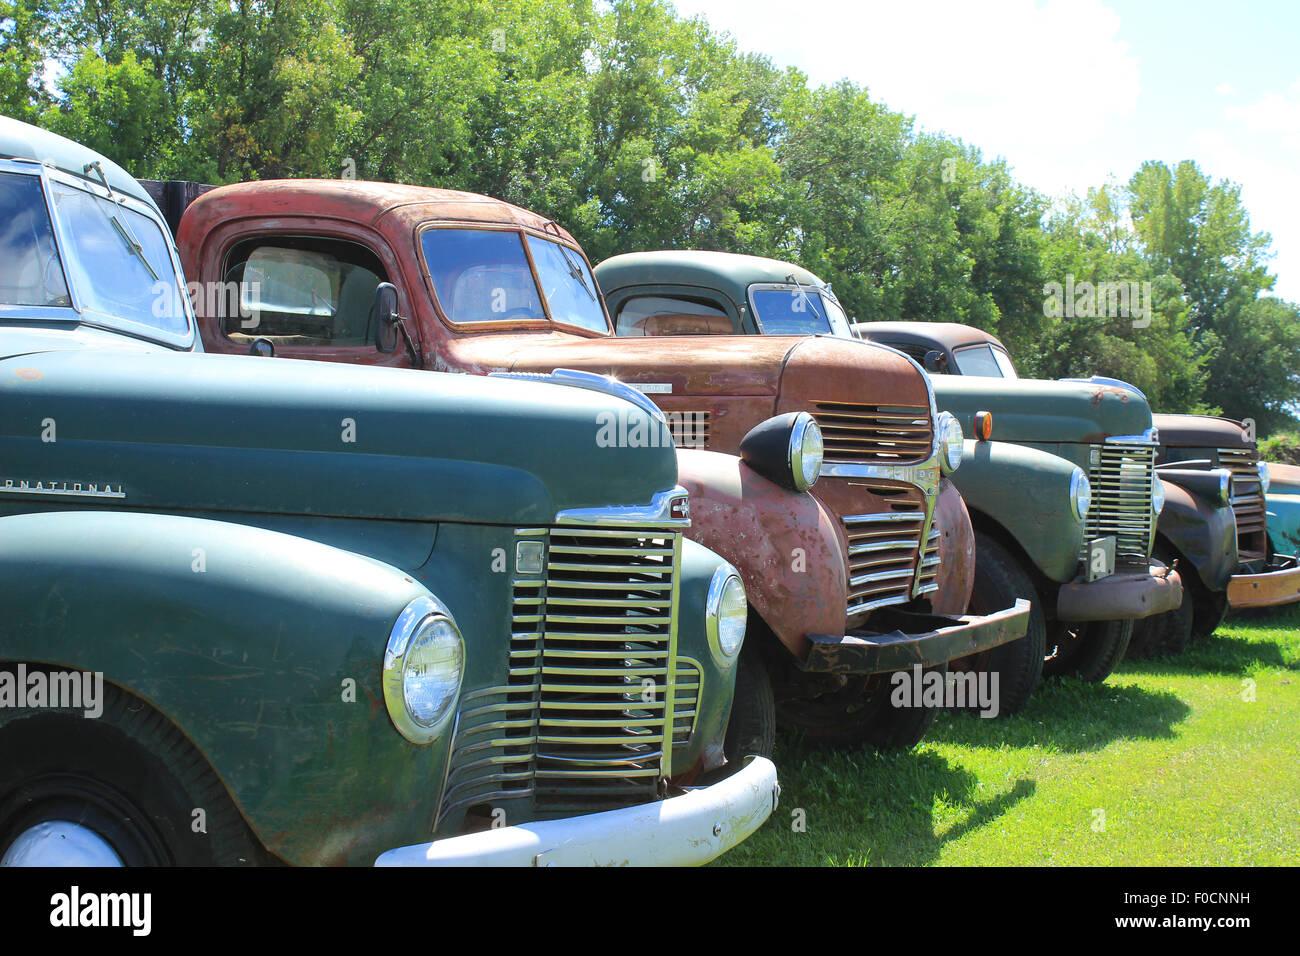 Wonderful Truck Trader Canada Ideas - Classic Cars Ideas - boiq.info